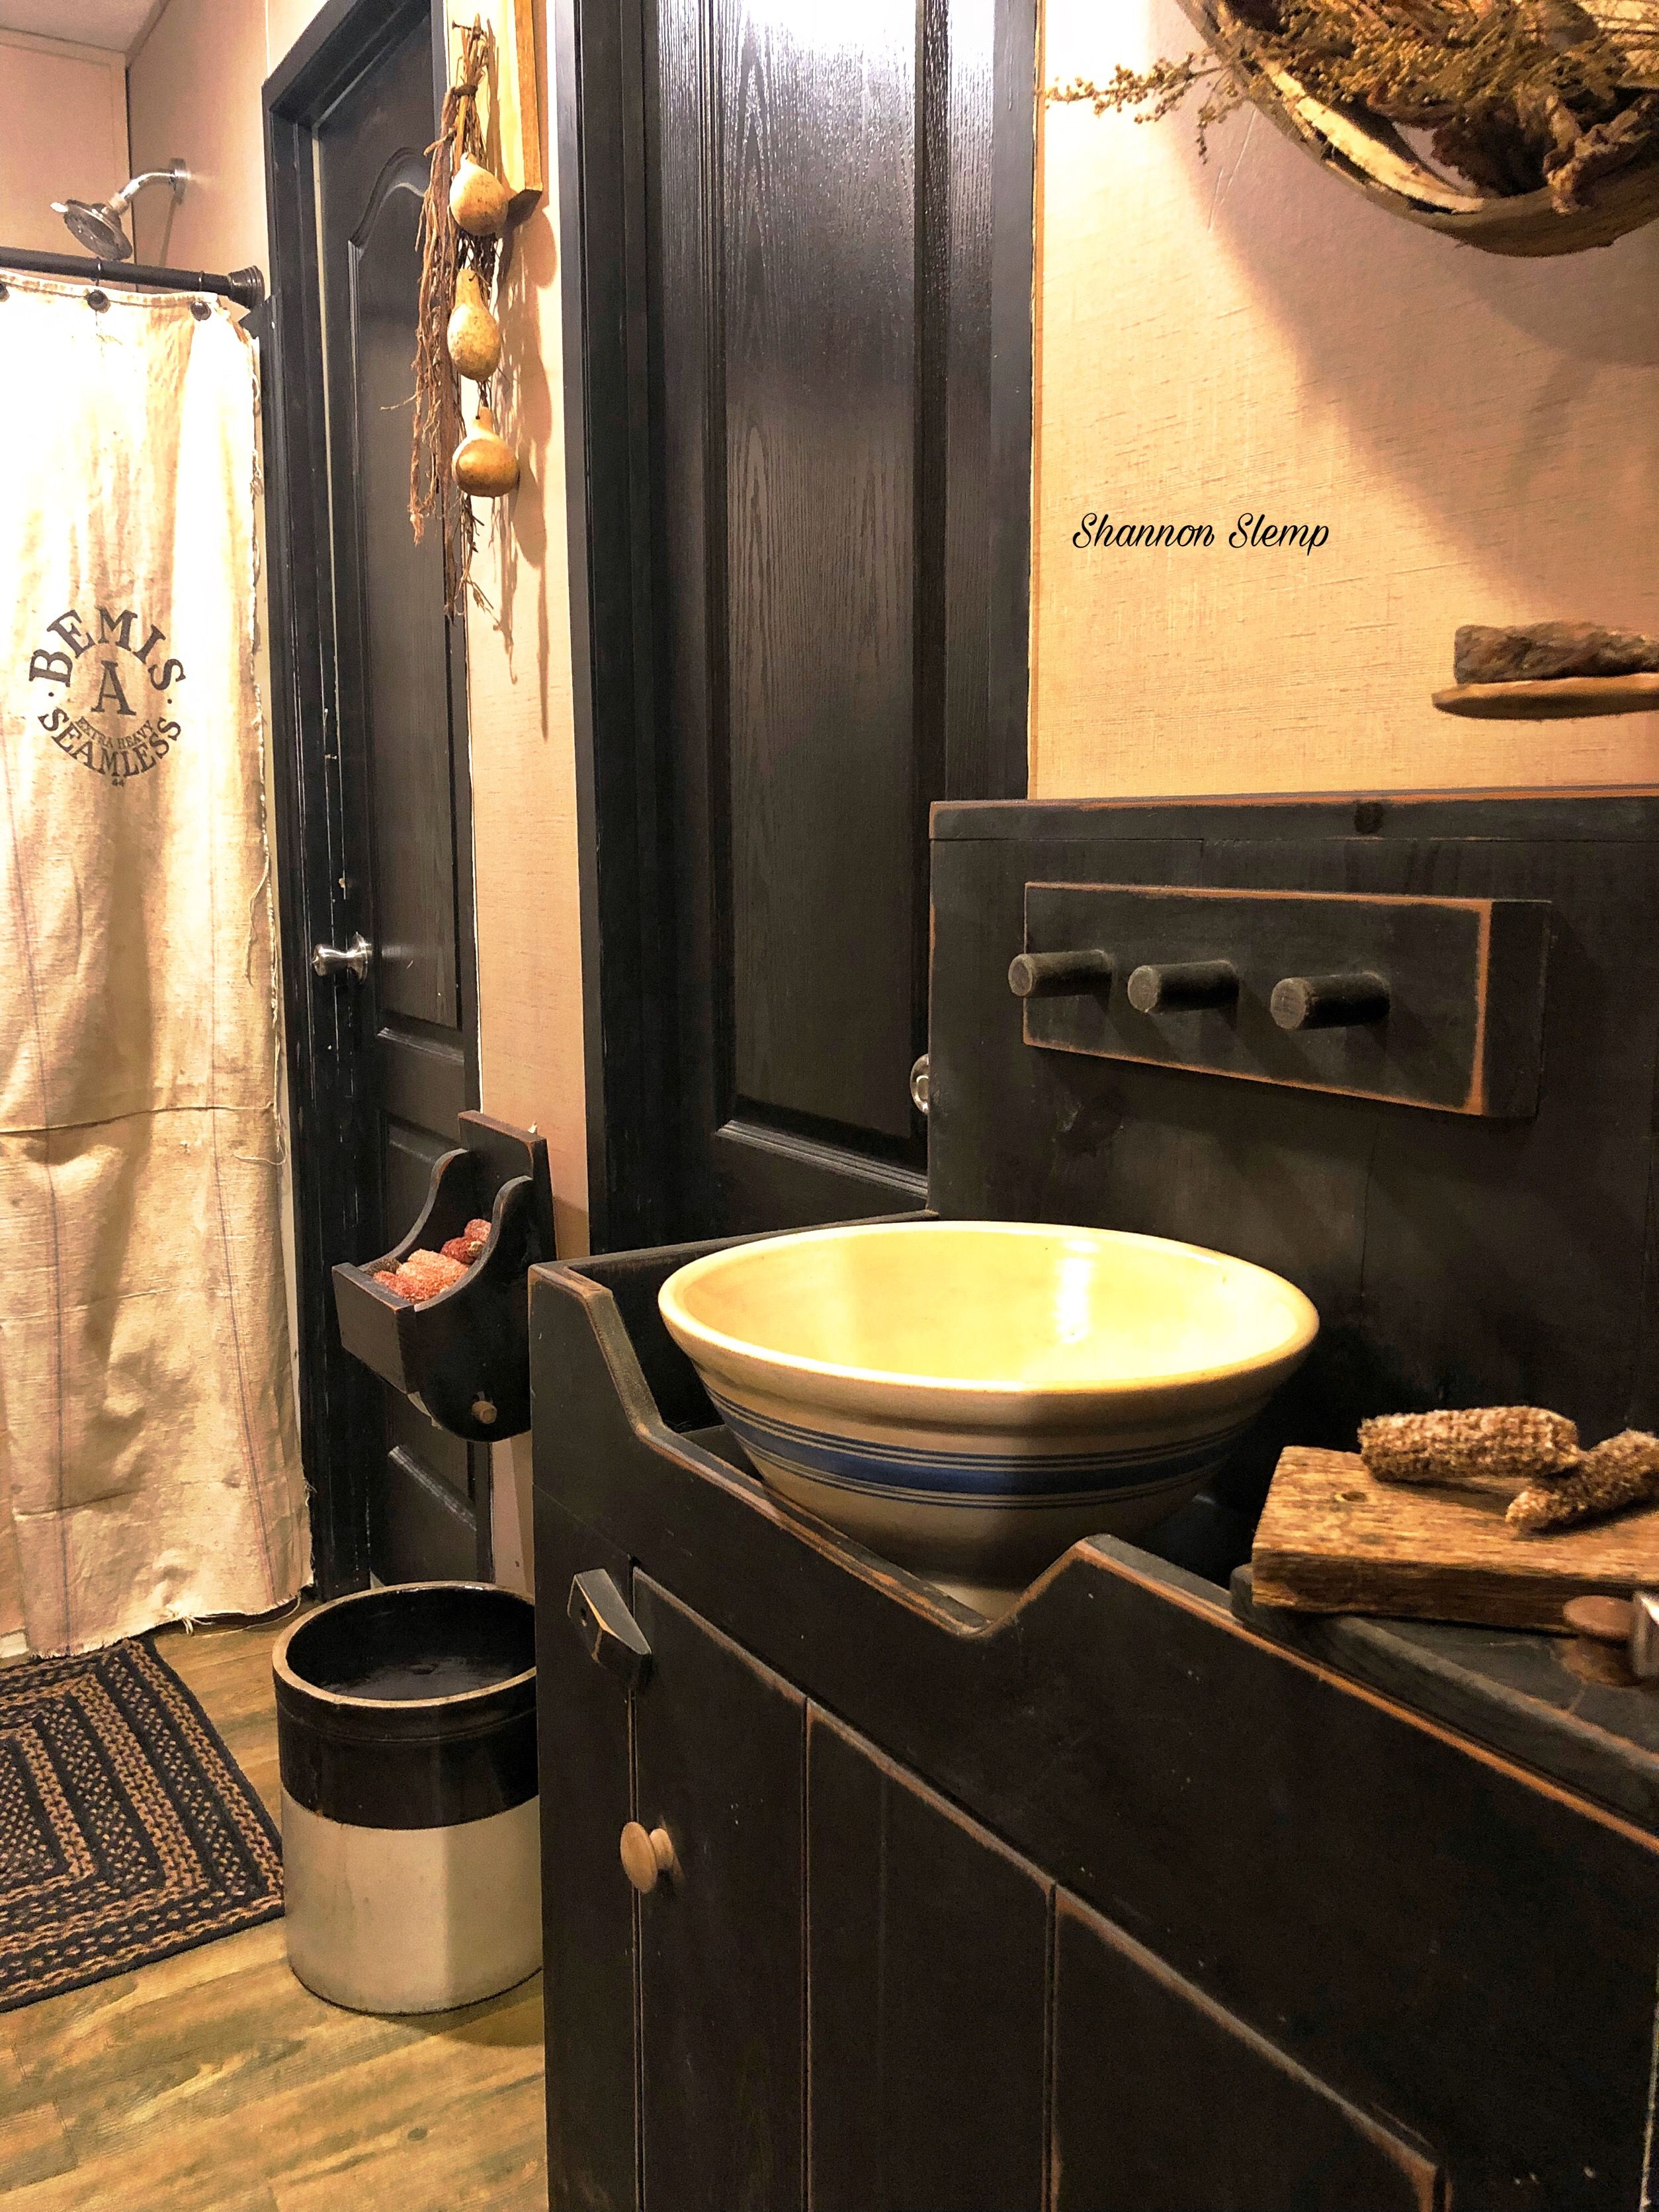 Feedsack Shower Curtain, dry sink, yellow ware, crock ...